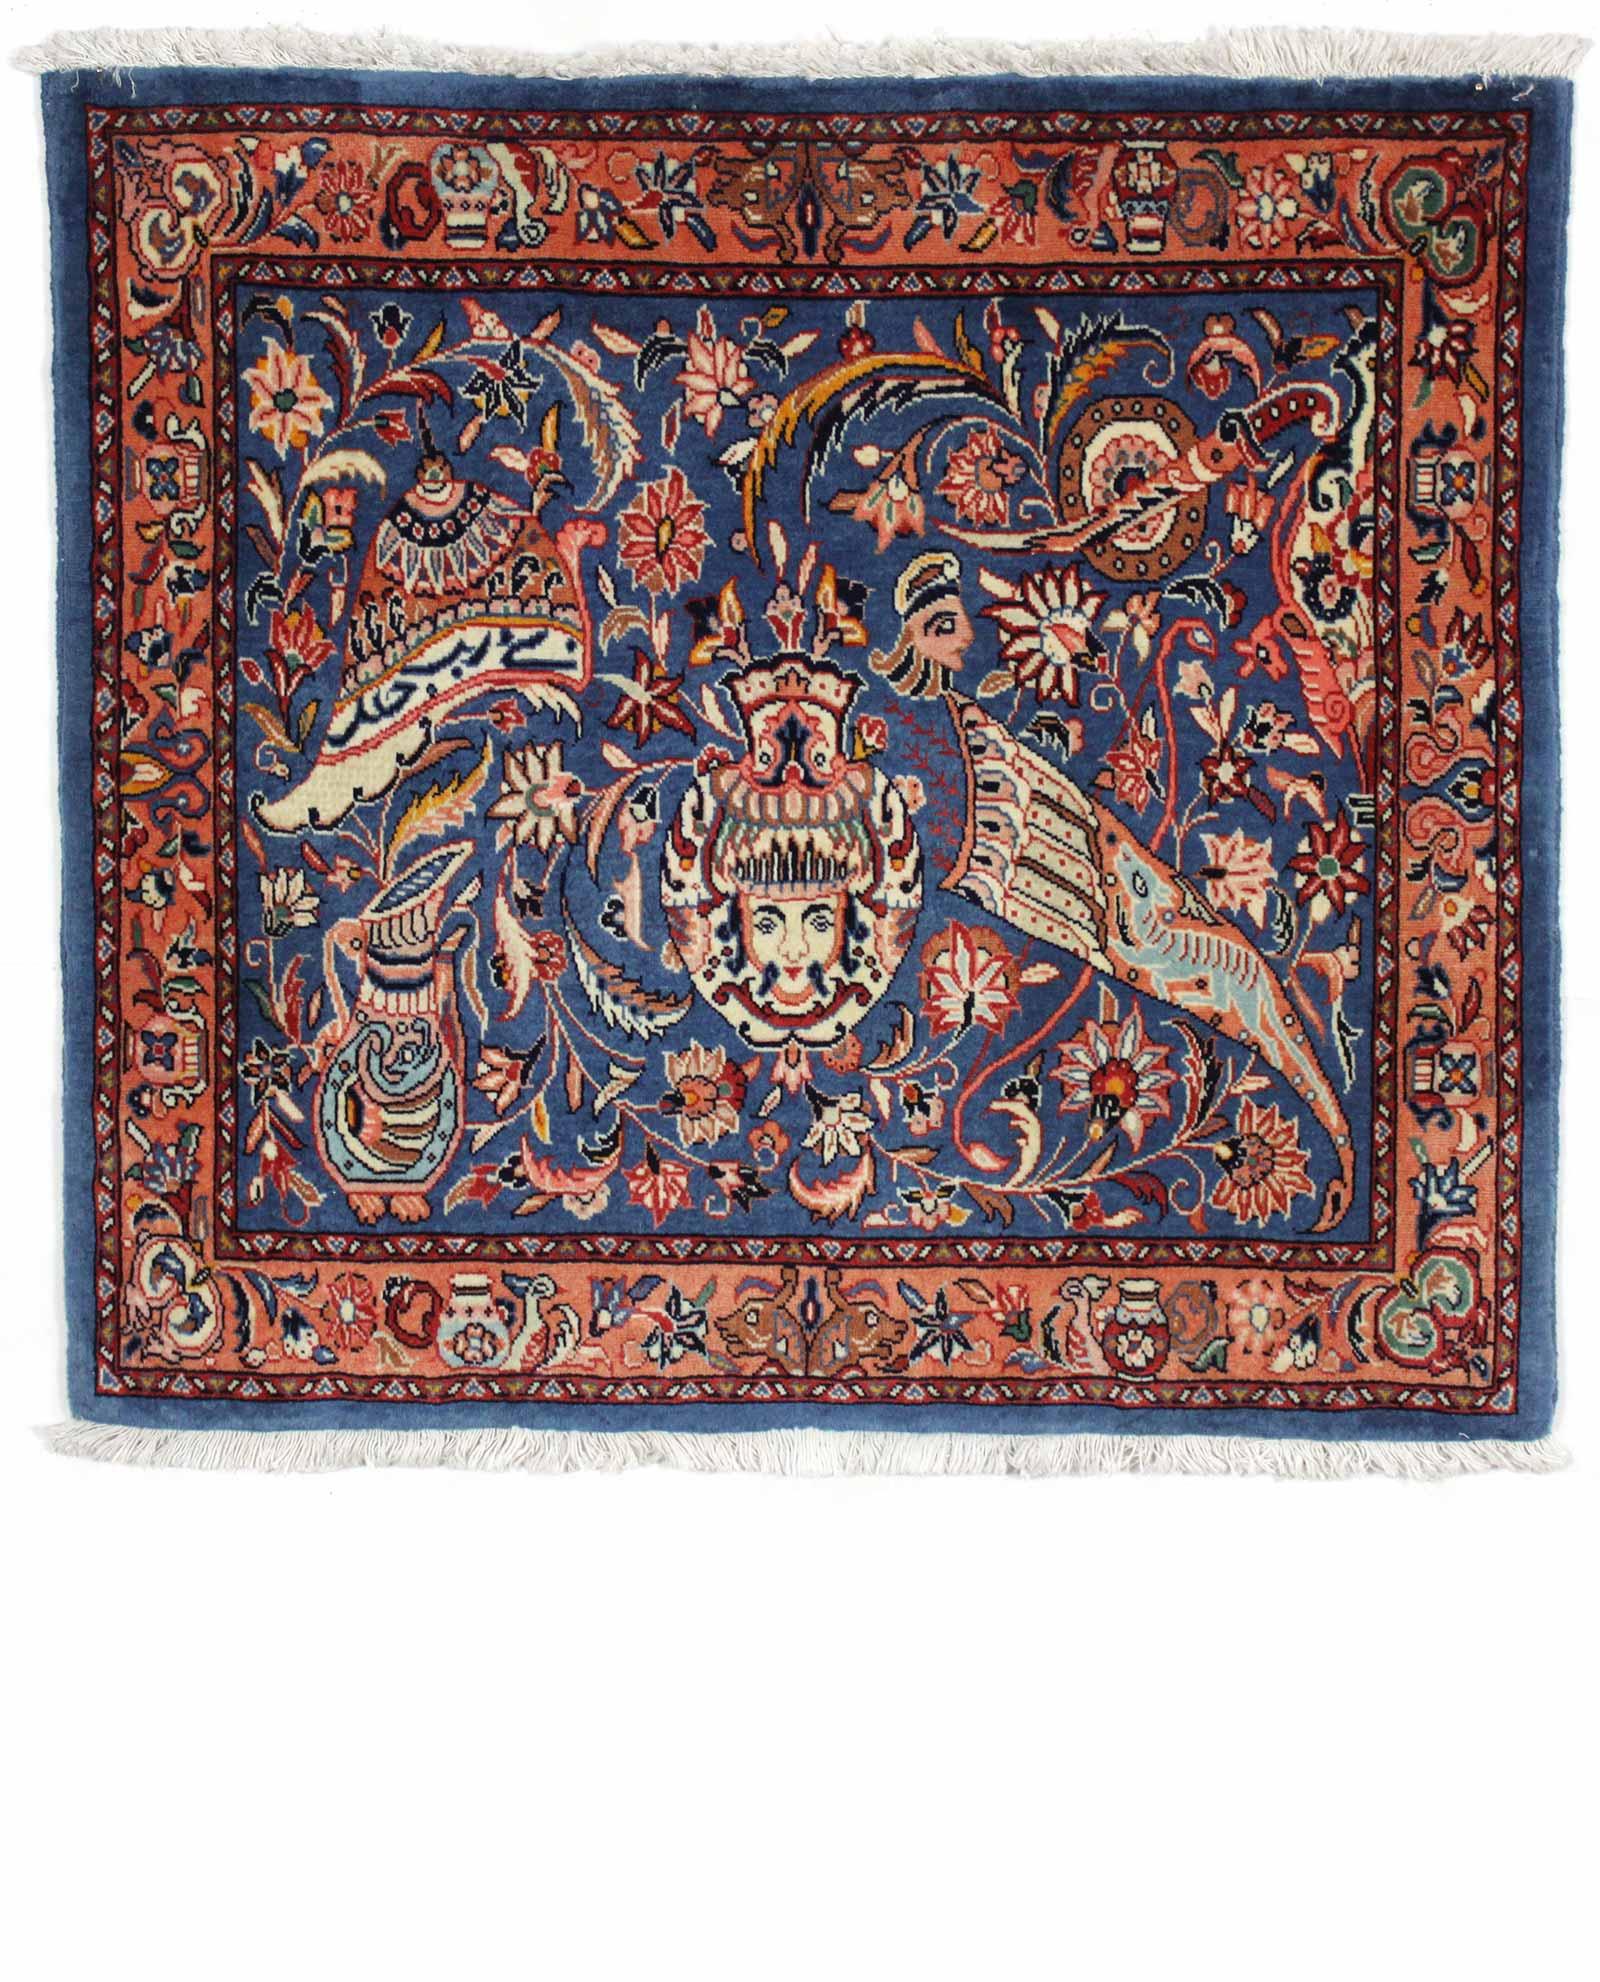 tapis persan sarough 14655 iranian carpet. Black Bedroom Furniture Sets. Home Design Ideas